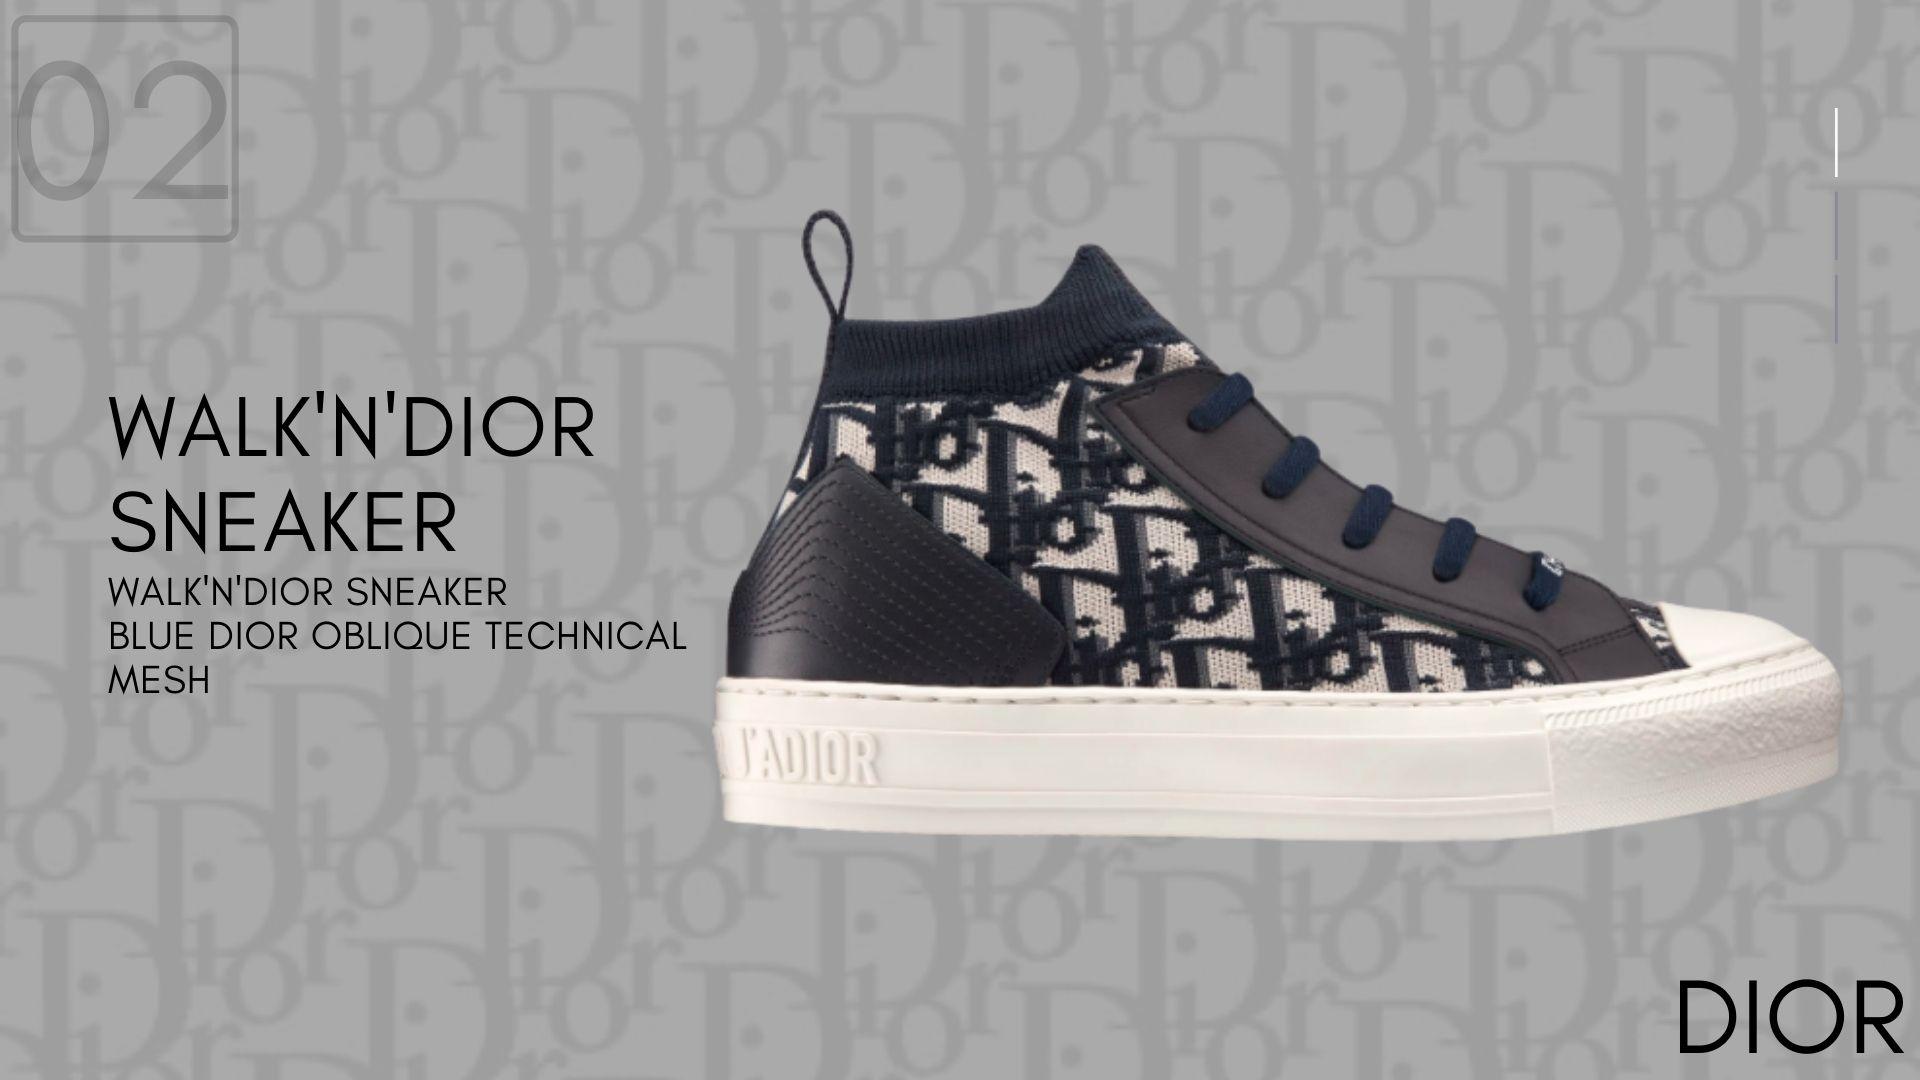 WALK'N'DIOR Blue Dior Oblique Technical Mesh-Dior Sneakers-รองเท้าดิออร์